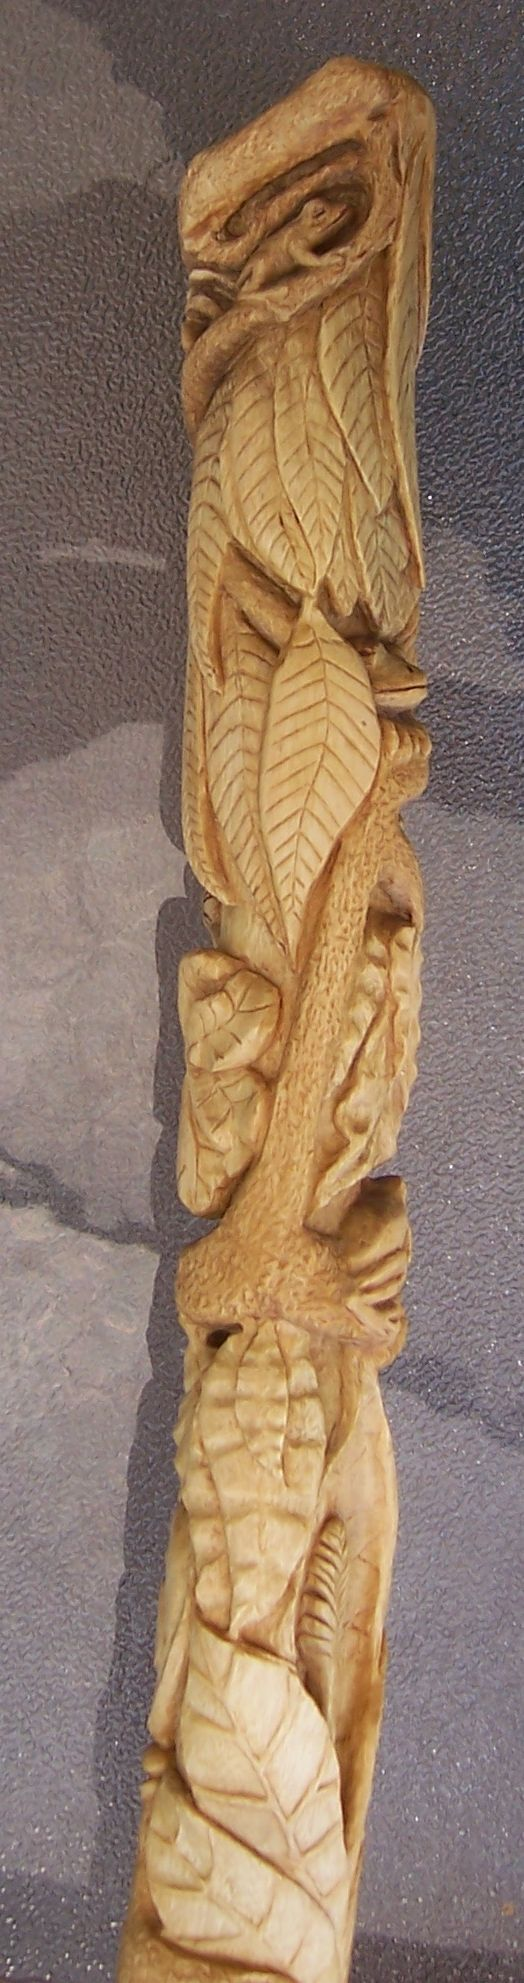 Best hand carved walking sticks ideas on pinterest